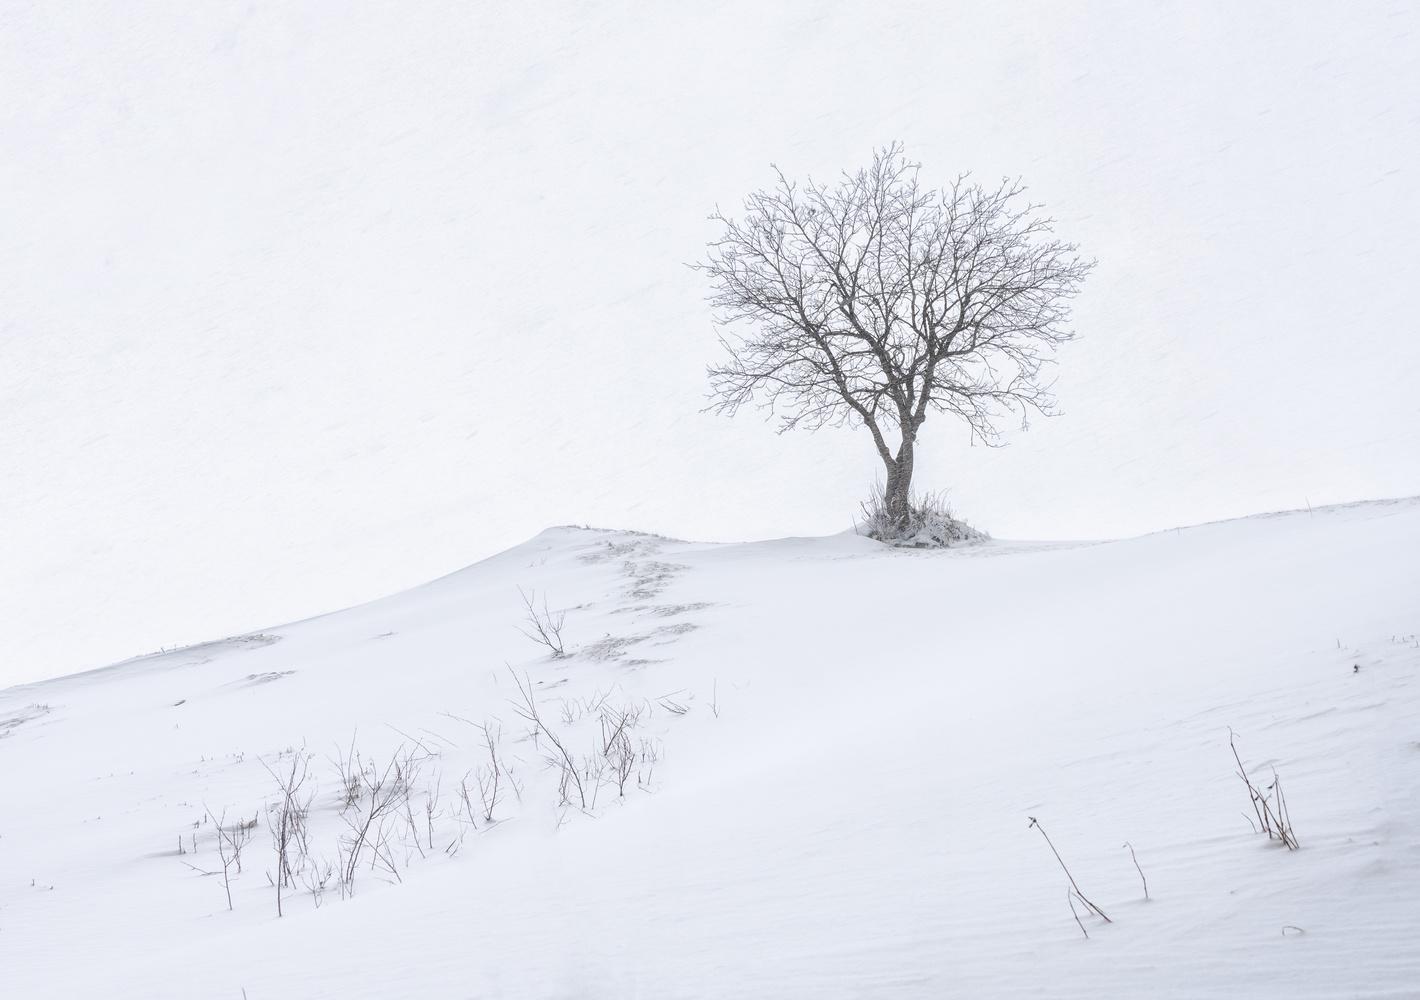 Tree on a snowy hill by Patrick Snitjer